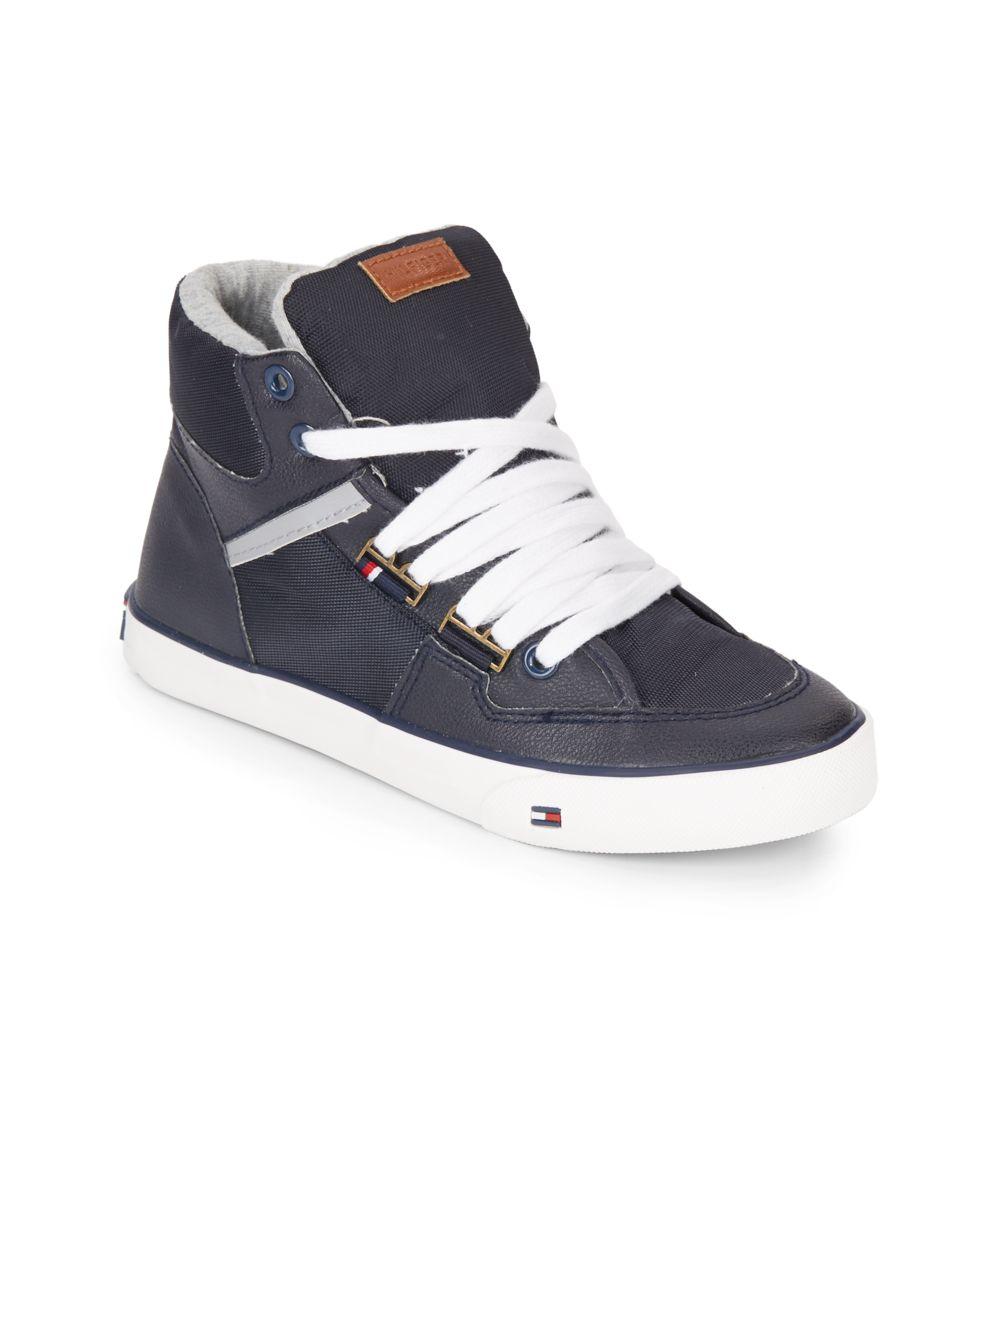 Tommy Hilfiger High-tops Et Chaussures De Sport nrZe7bE